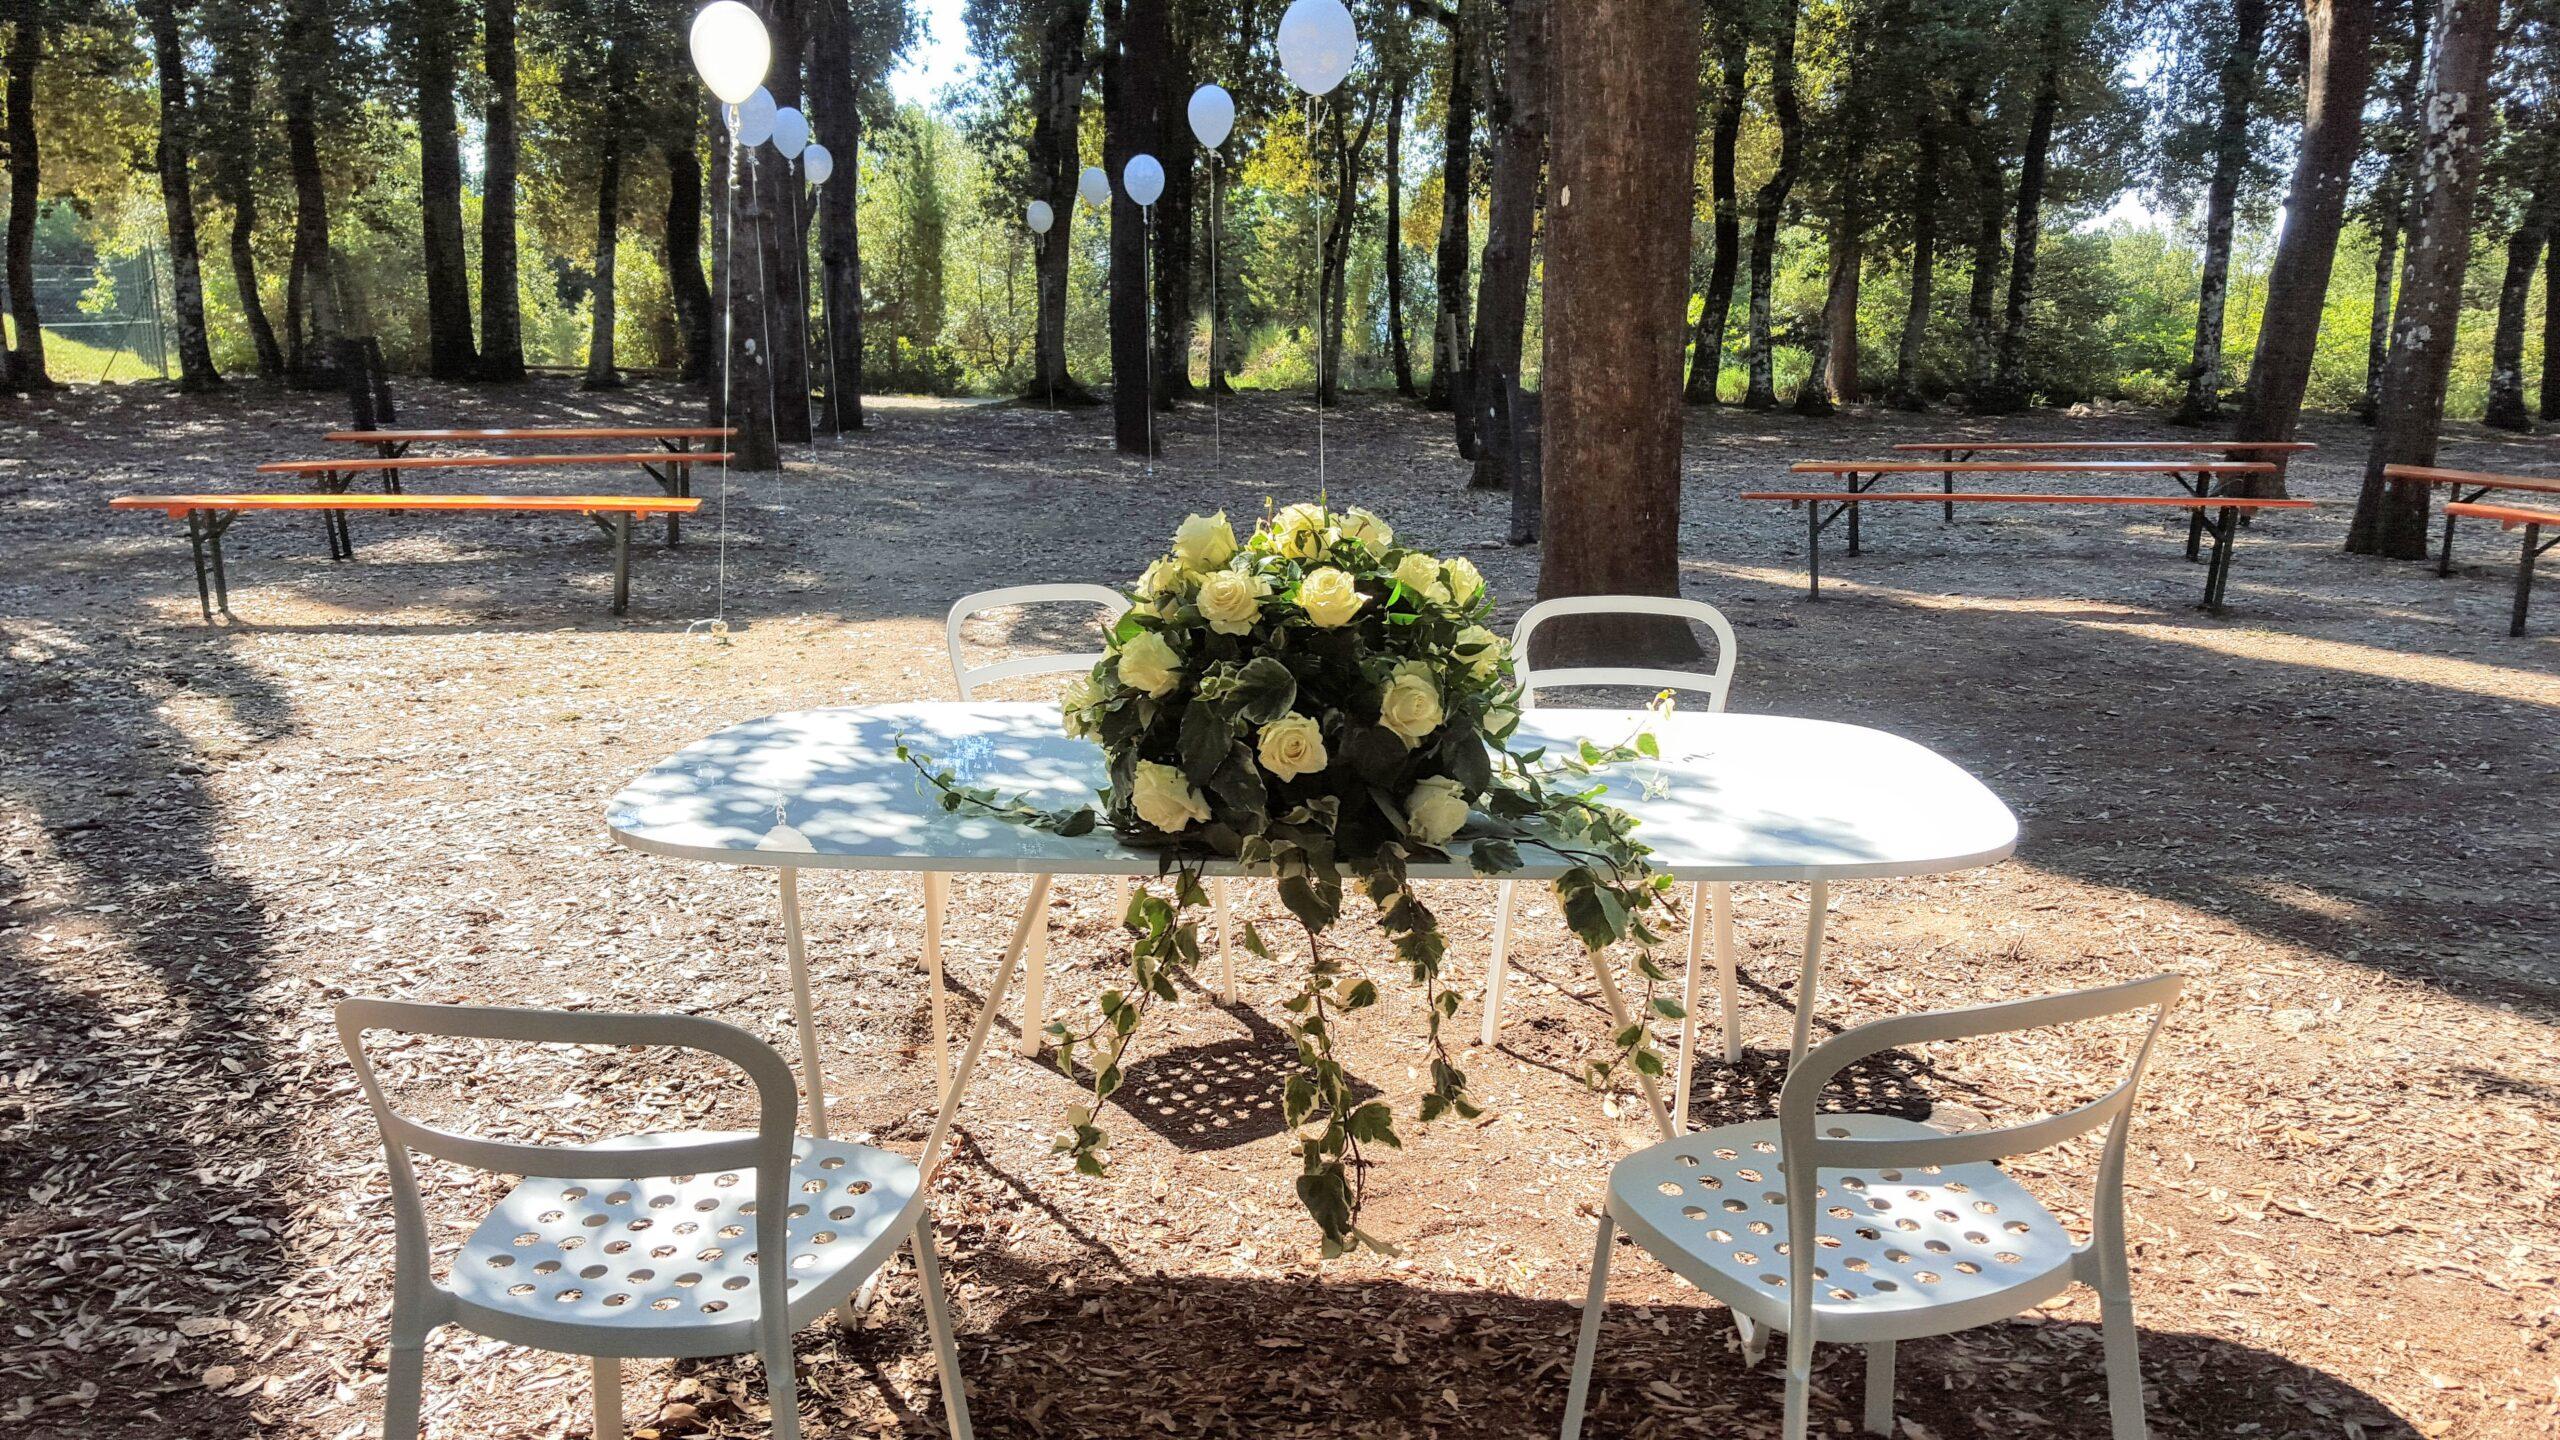 Wedding 30 Agosto 2015 – Parco Il Tondo – Montefollinico e ricevimento Ristorante La Chiusa Montefollonico